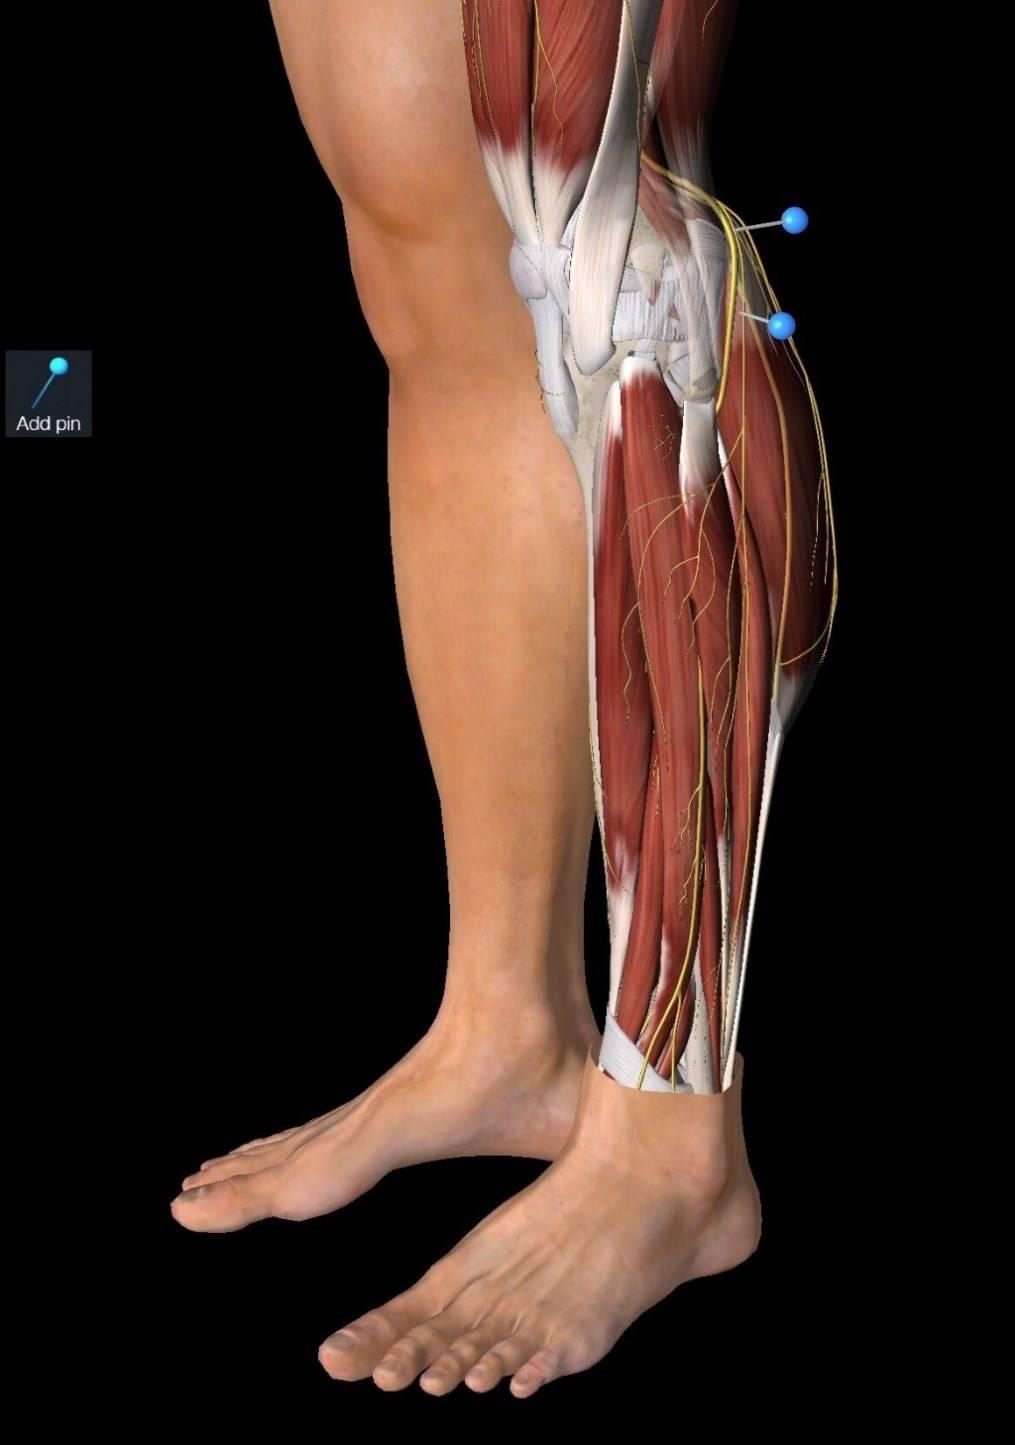 невропатия малоберцового нерва симптомы